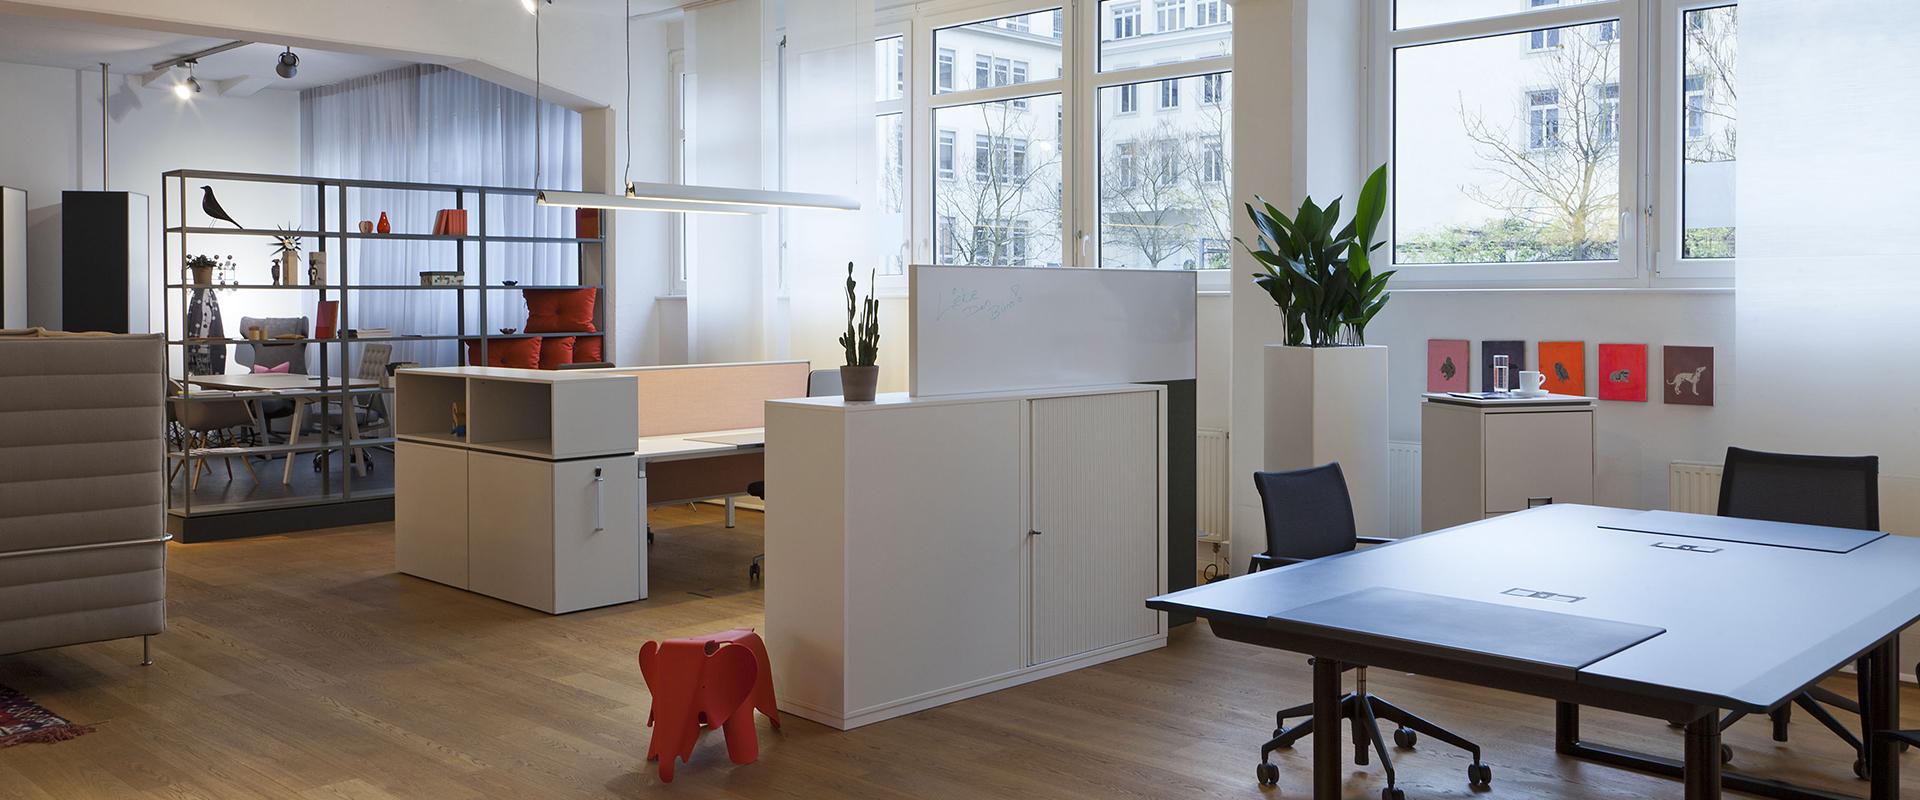 b ro objekteinrichtung in m nchen s w b roraumkultur gmbh. Black Bedroom Furniture Sets. Home Design Ideas